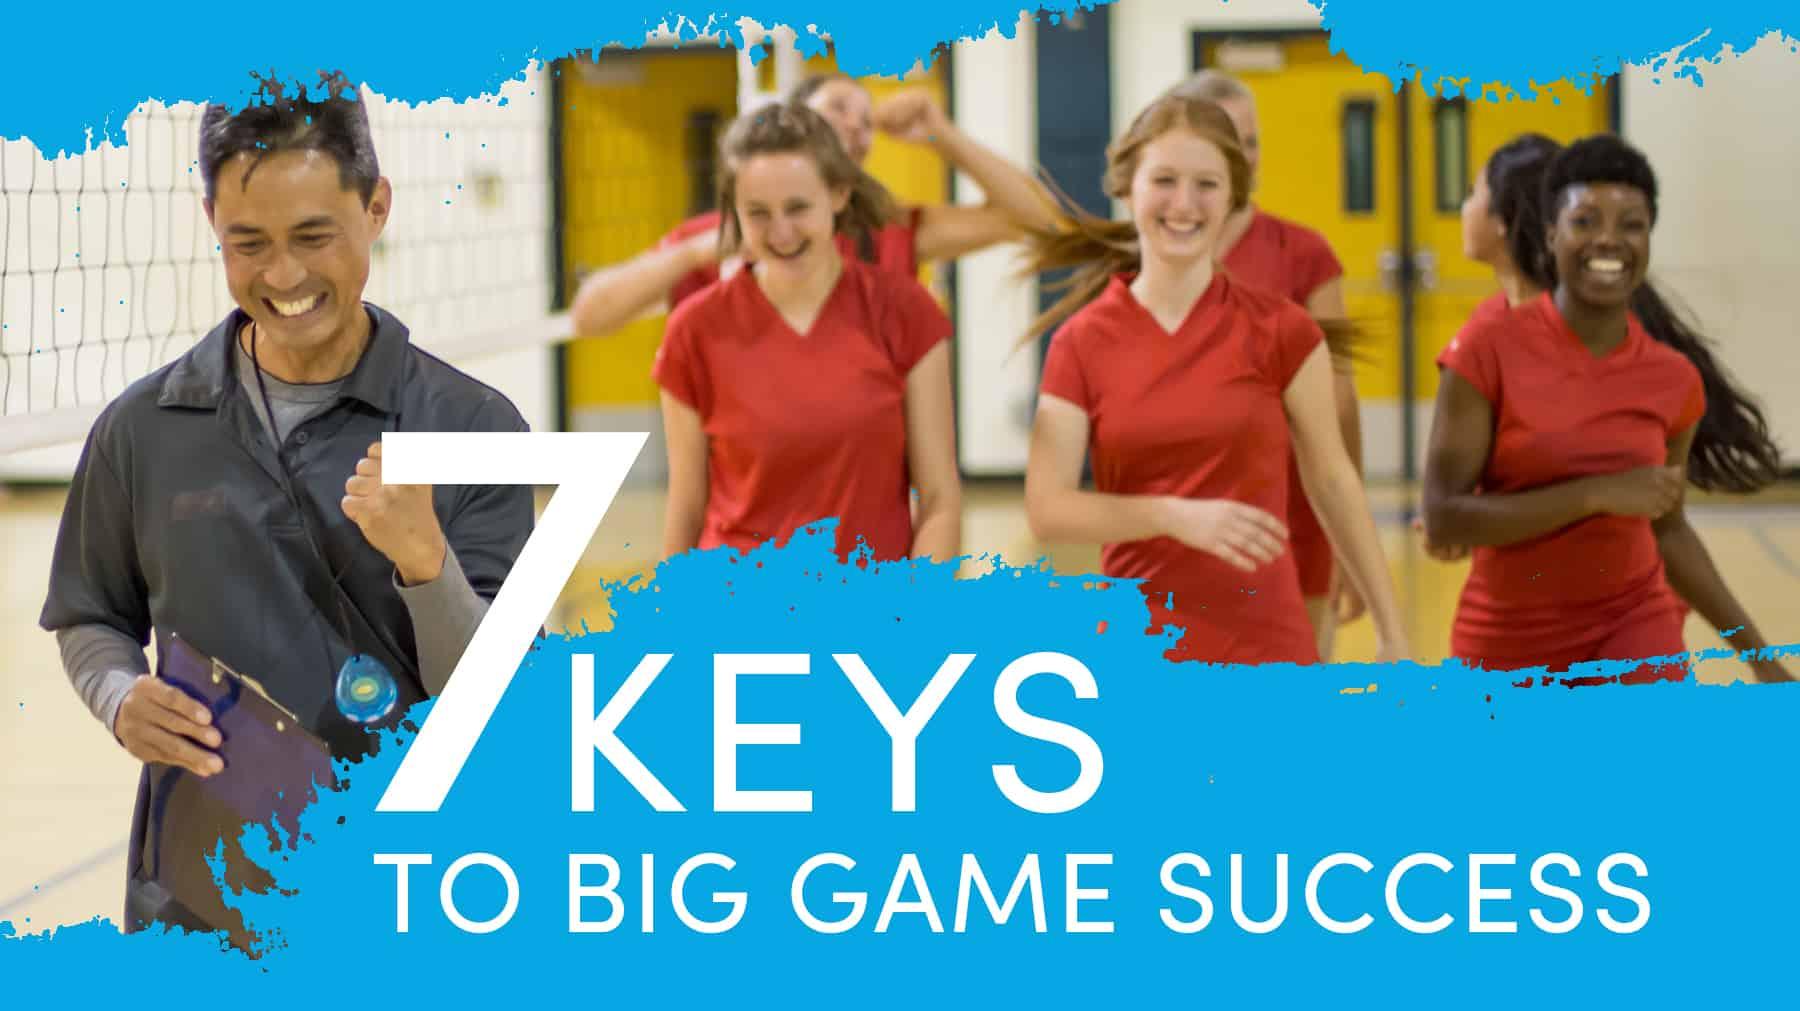 7 keys to big game success